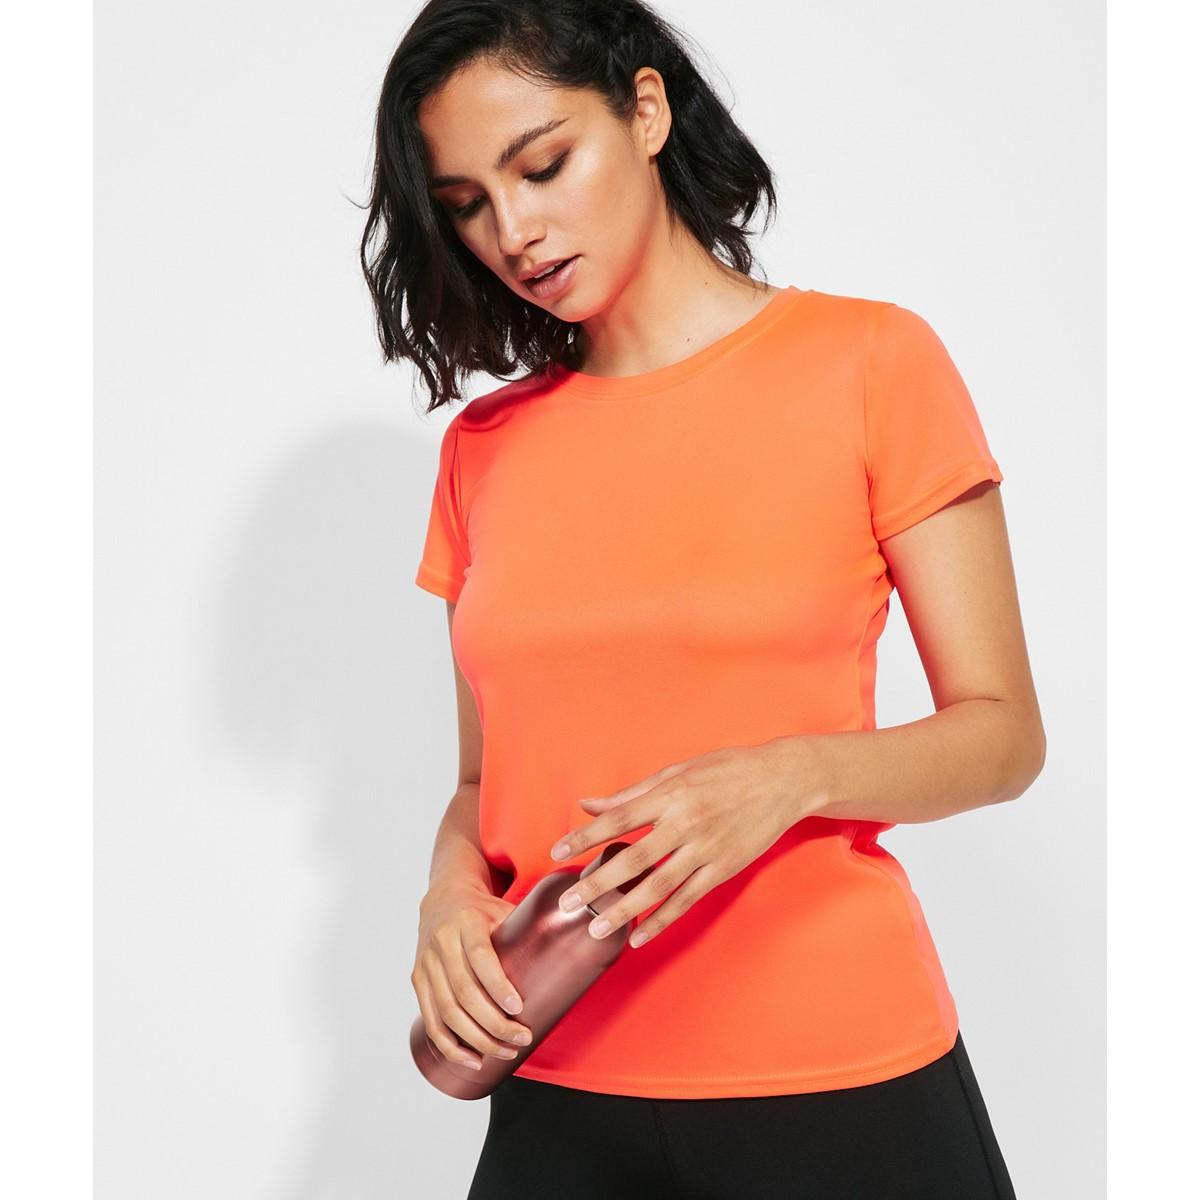 a049df1c3a2b05 t-shirt-roly-montecarlo-woman_7959_full.jpg